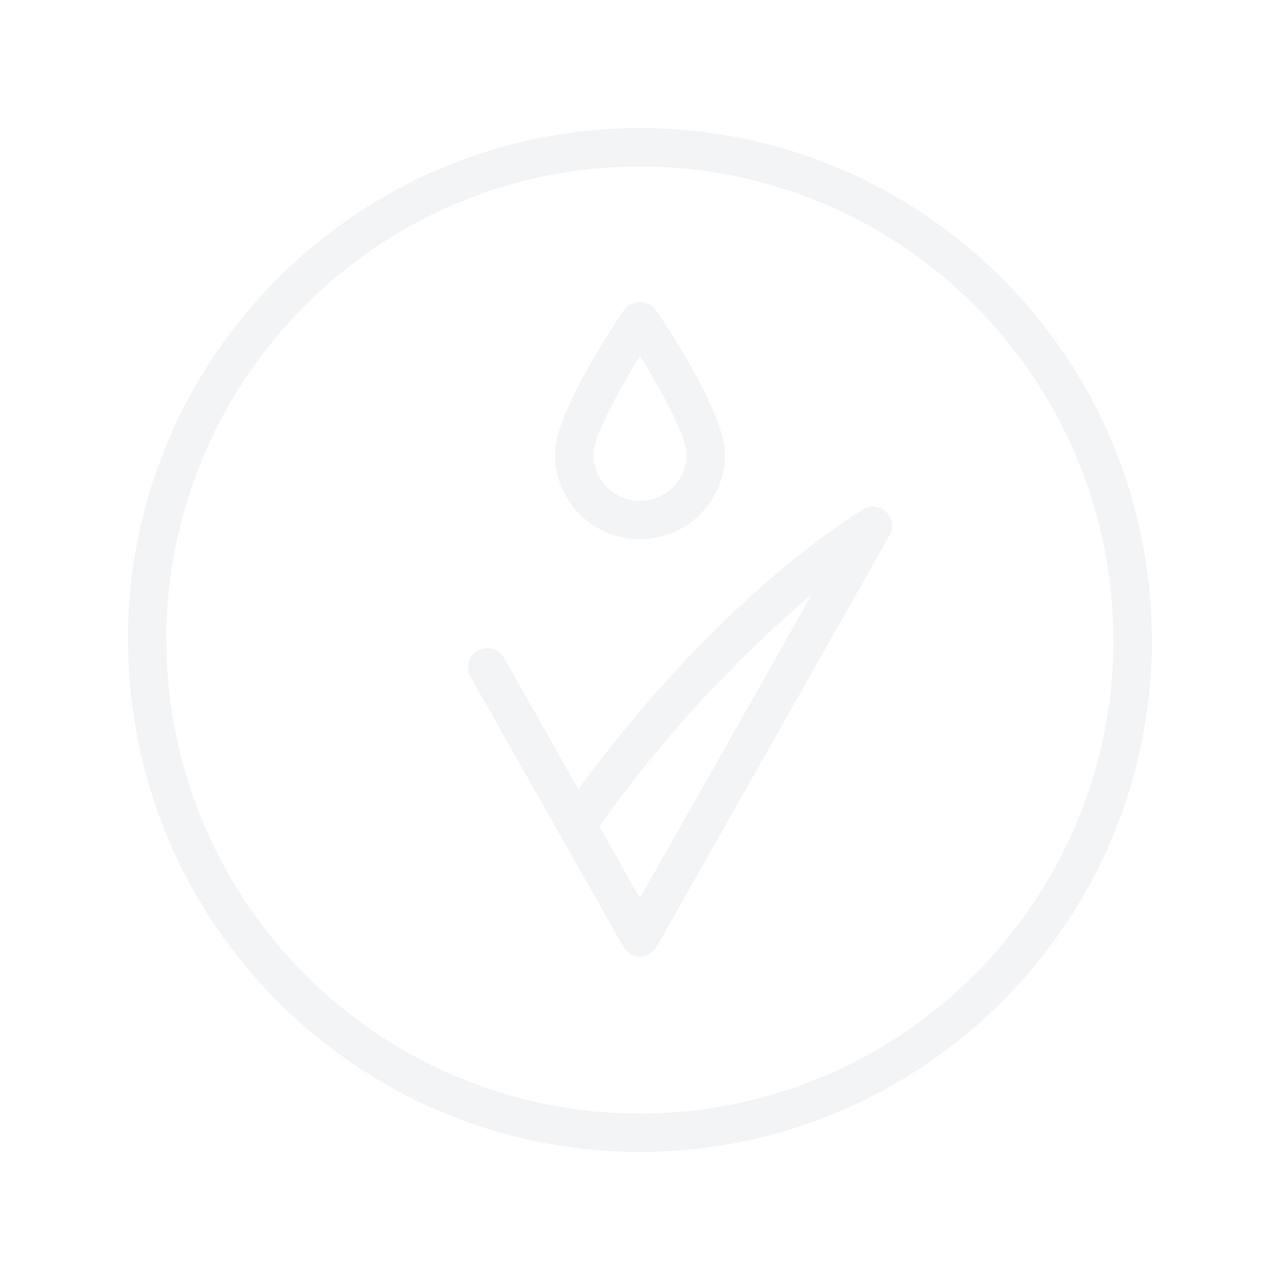 VICHY Dercos Aminexil Clinical 5 Treatment For Men 21x6ml